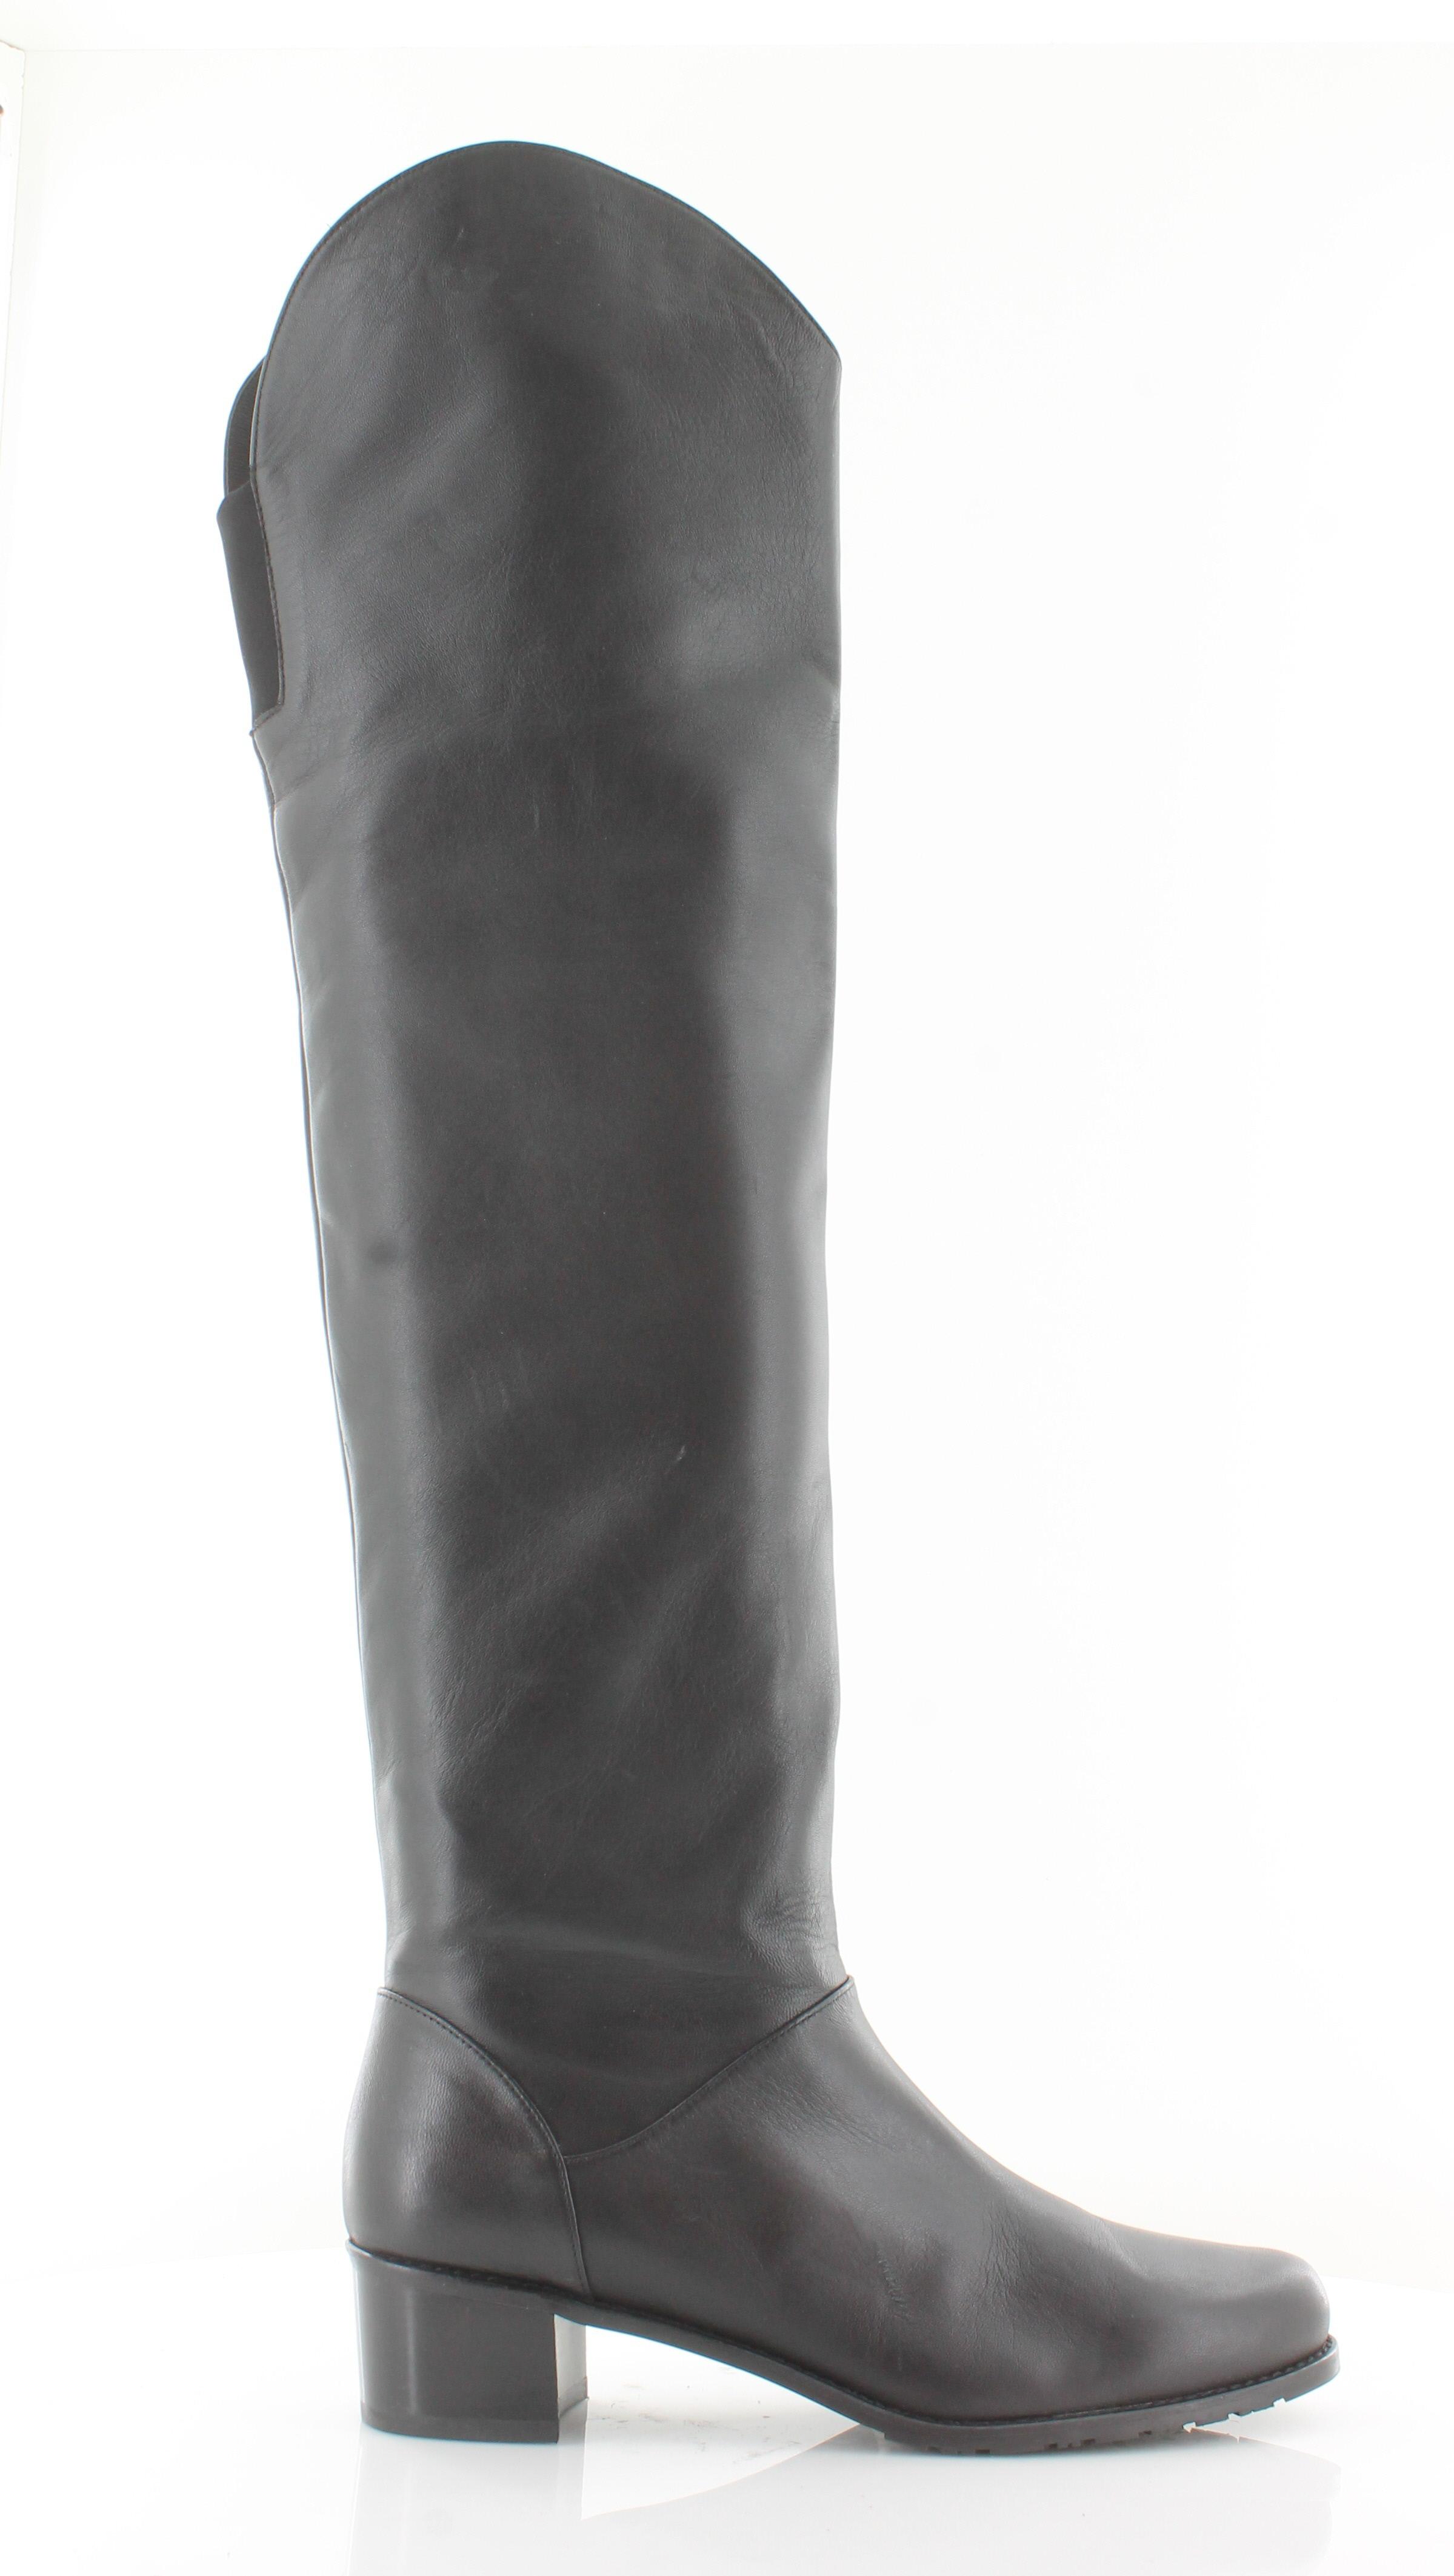 Stuart Weitzman Nudunkirk Women's Boots Black Size 8 M